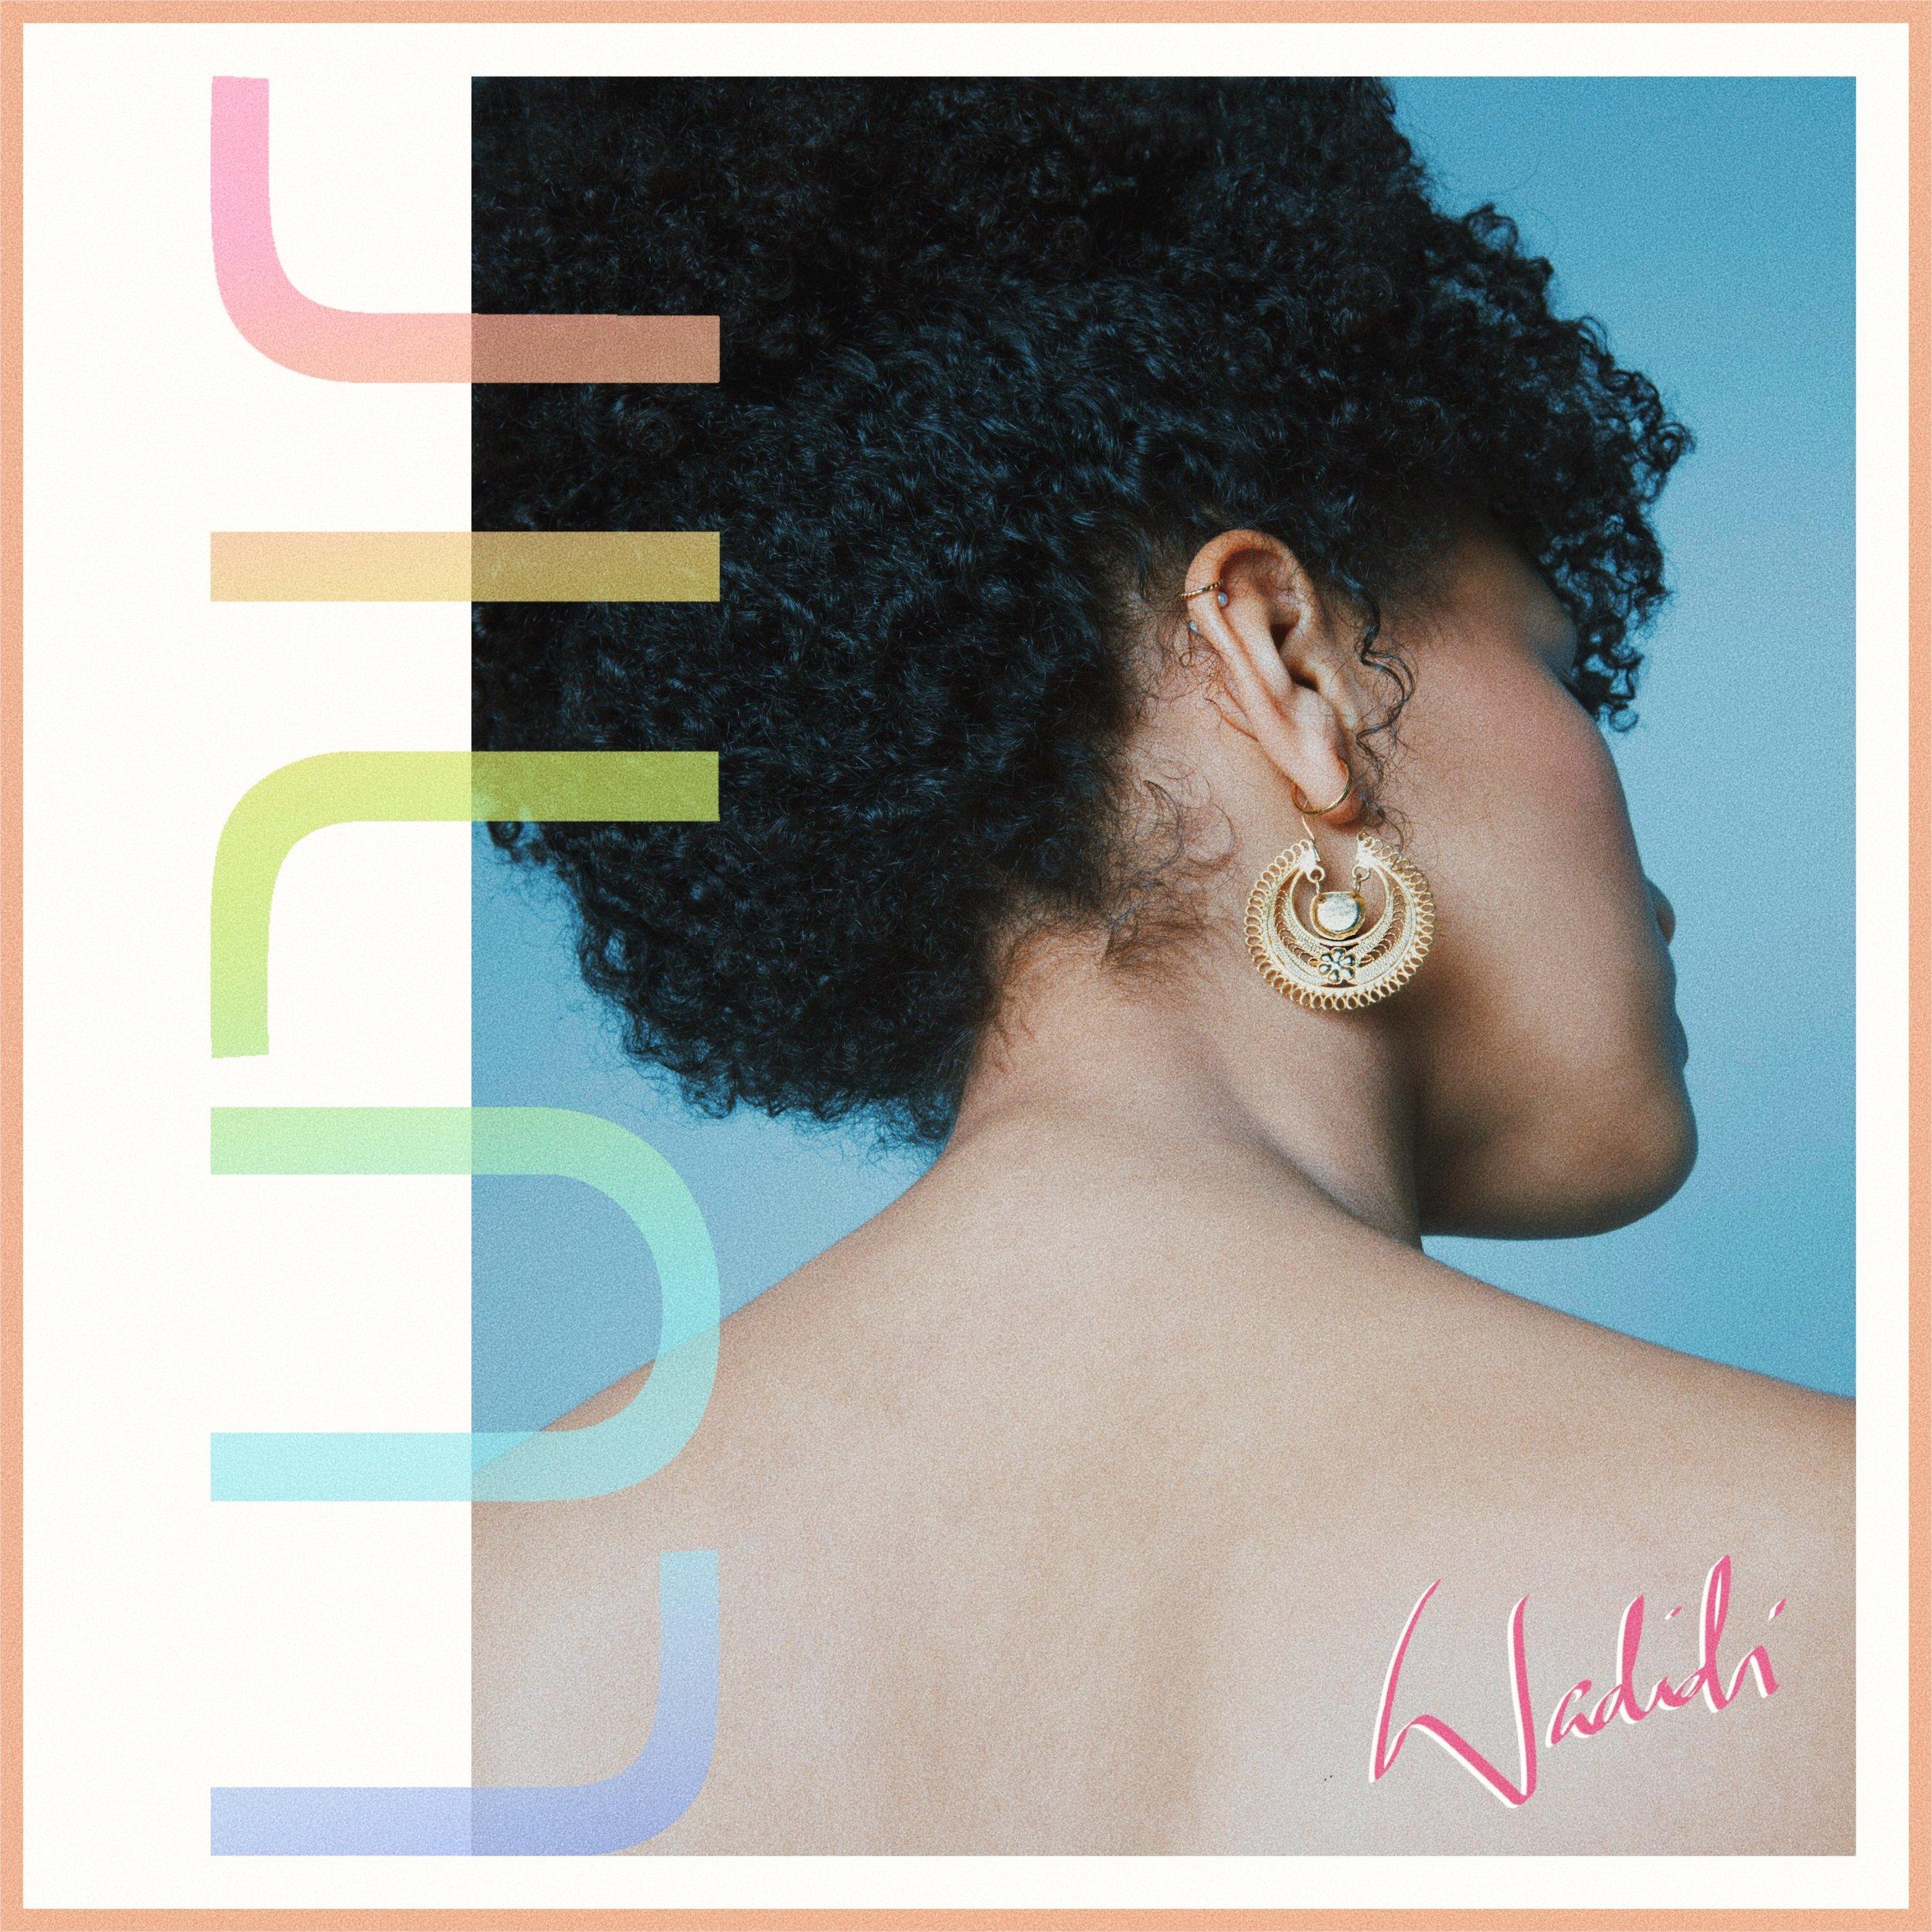 LUNIR - Wadidi Cover.JPG